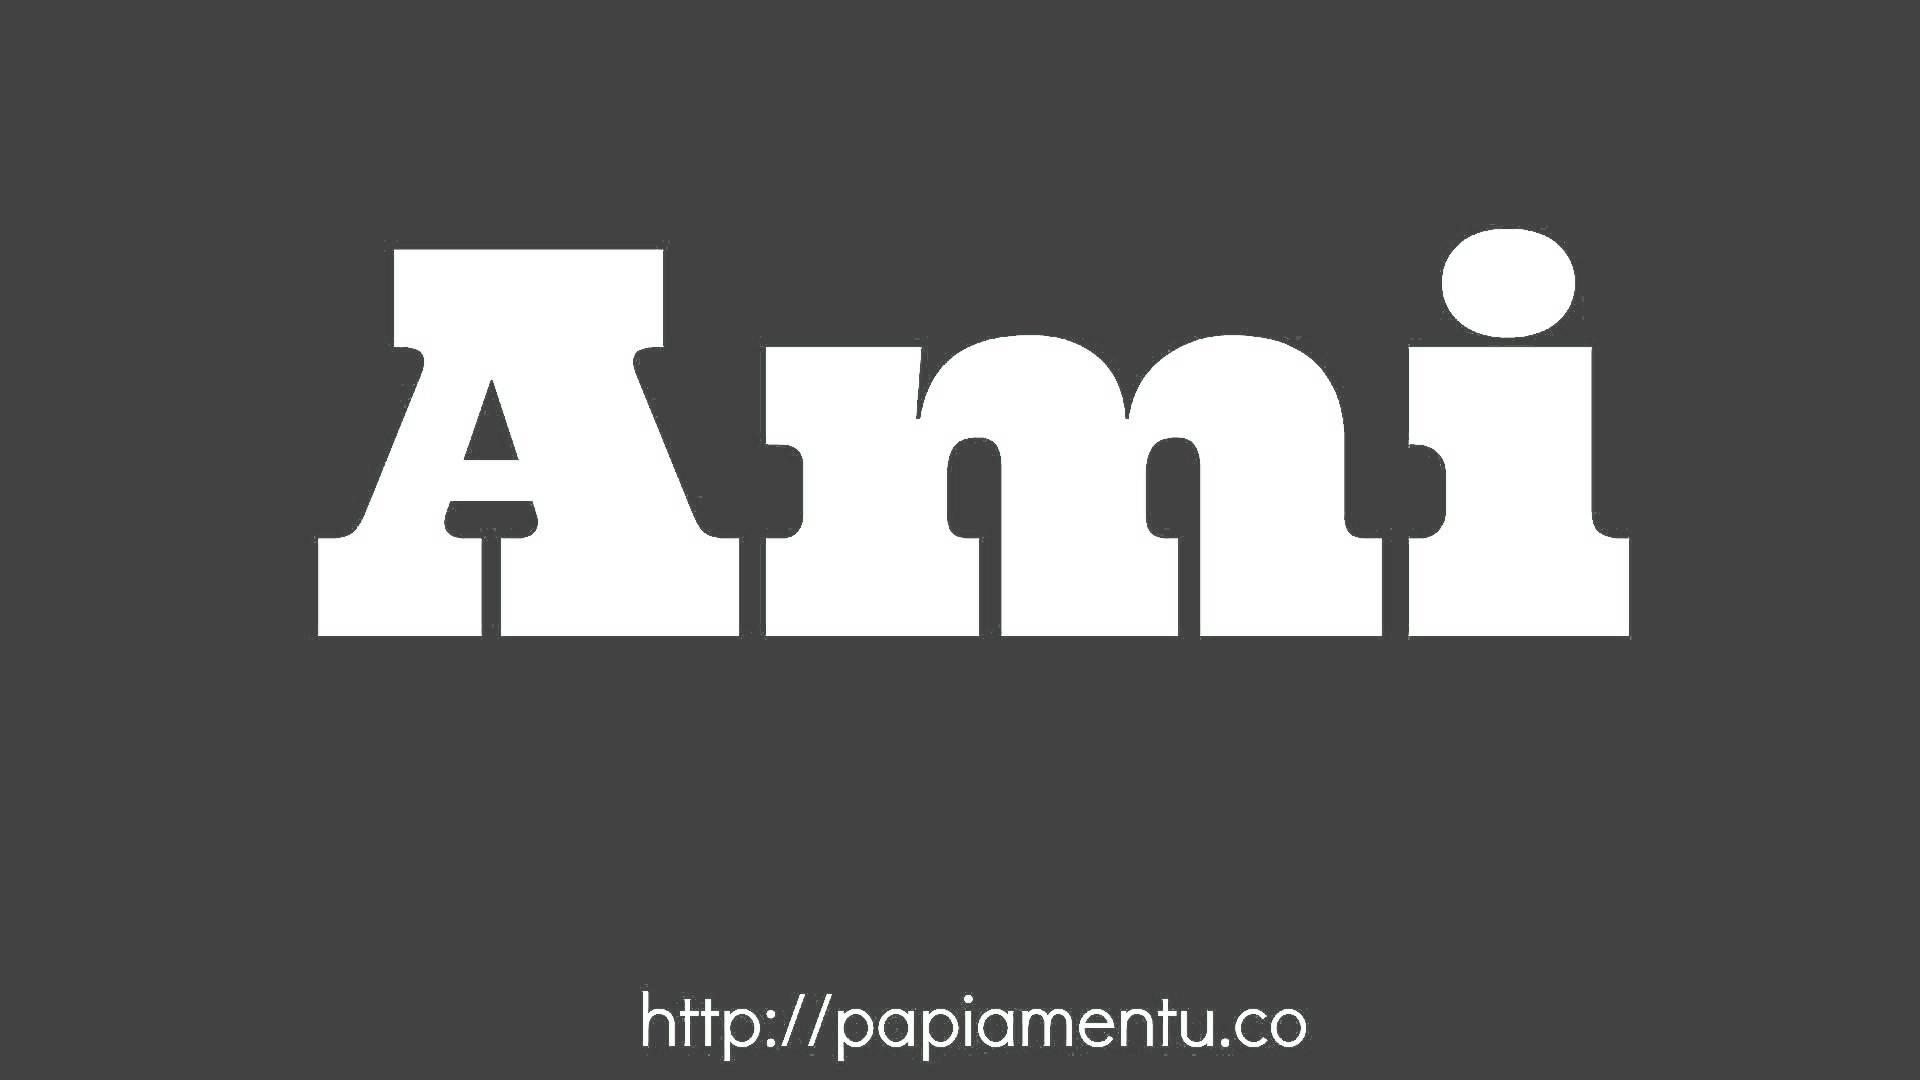 Ami - Zo zeg je Ik in Papiamentu